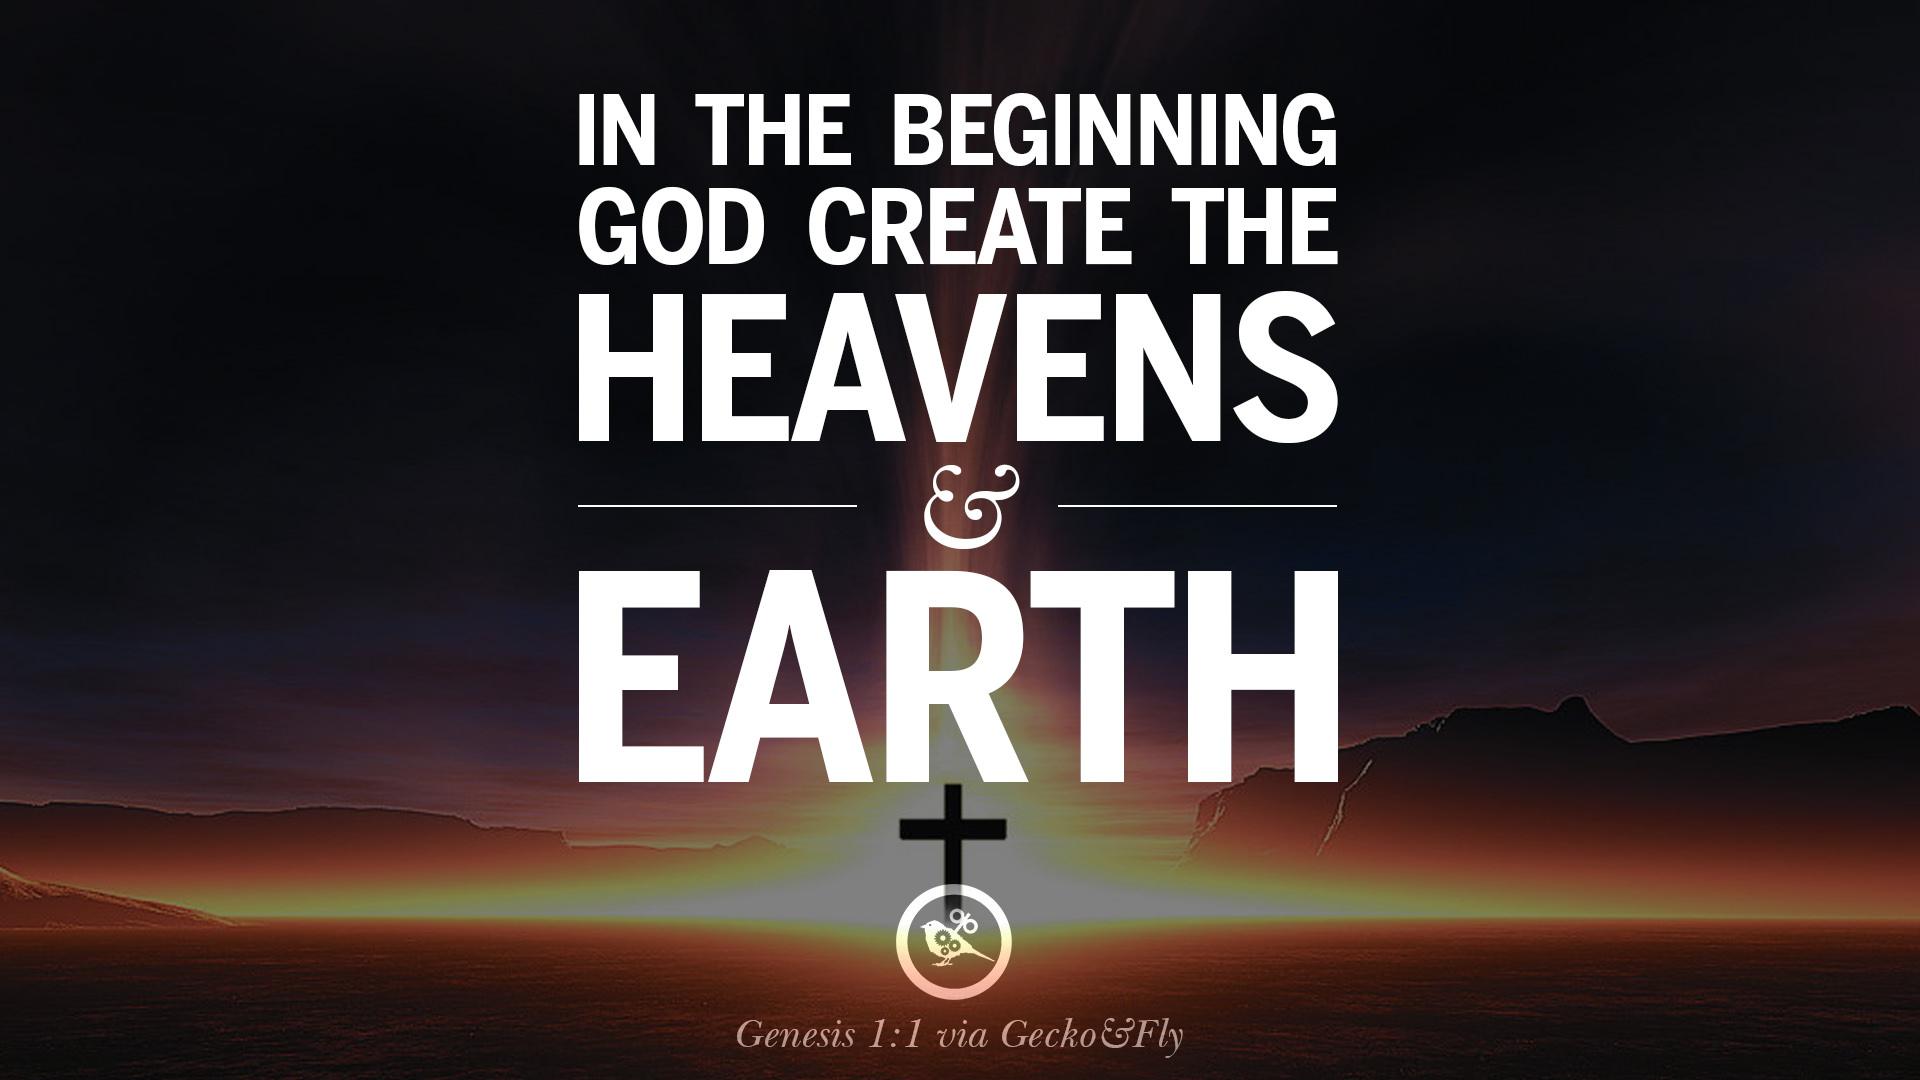 Bible Quotes About Relationships 10 Beautiful Holy Bible Versesjohn Jeremiah Genesis Matthew